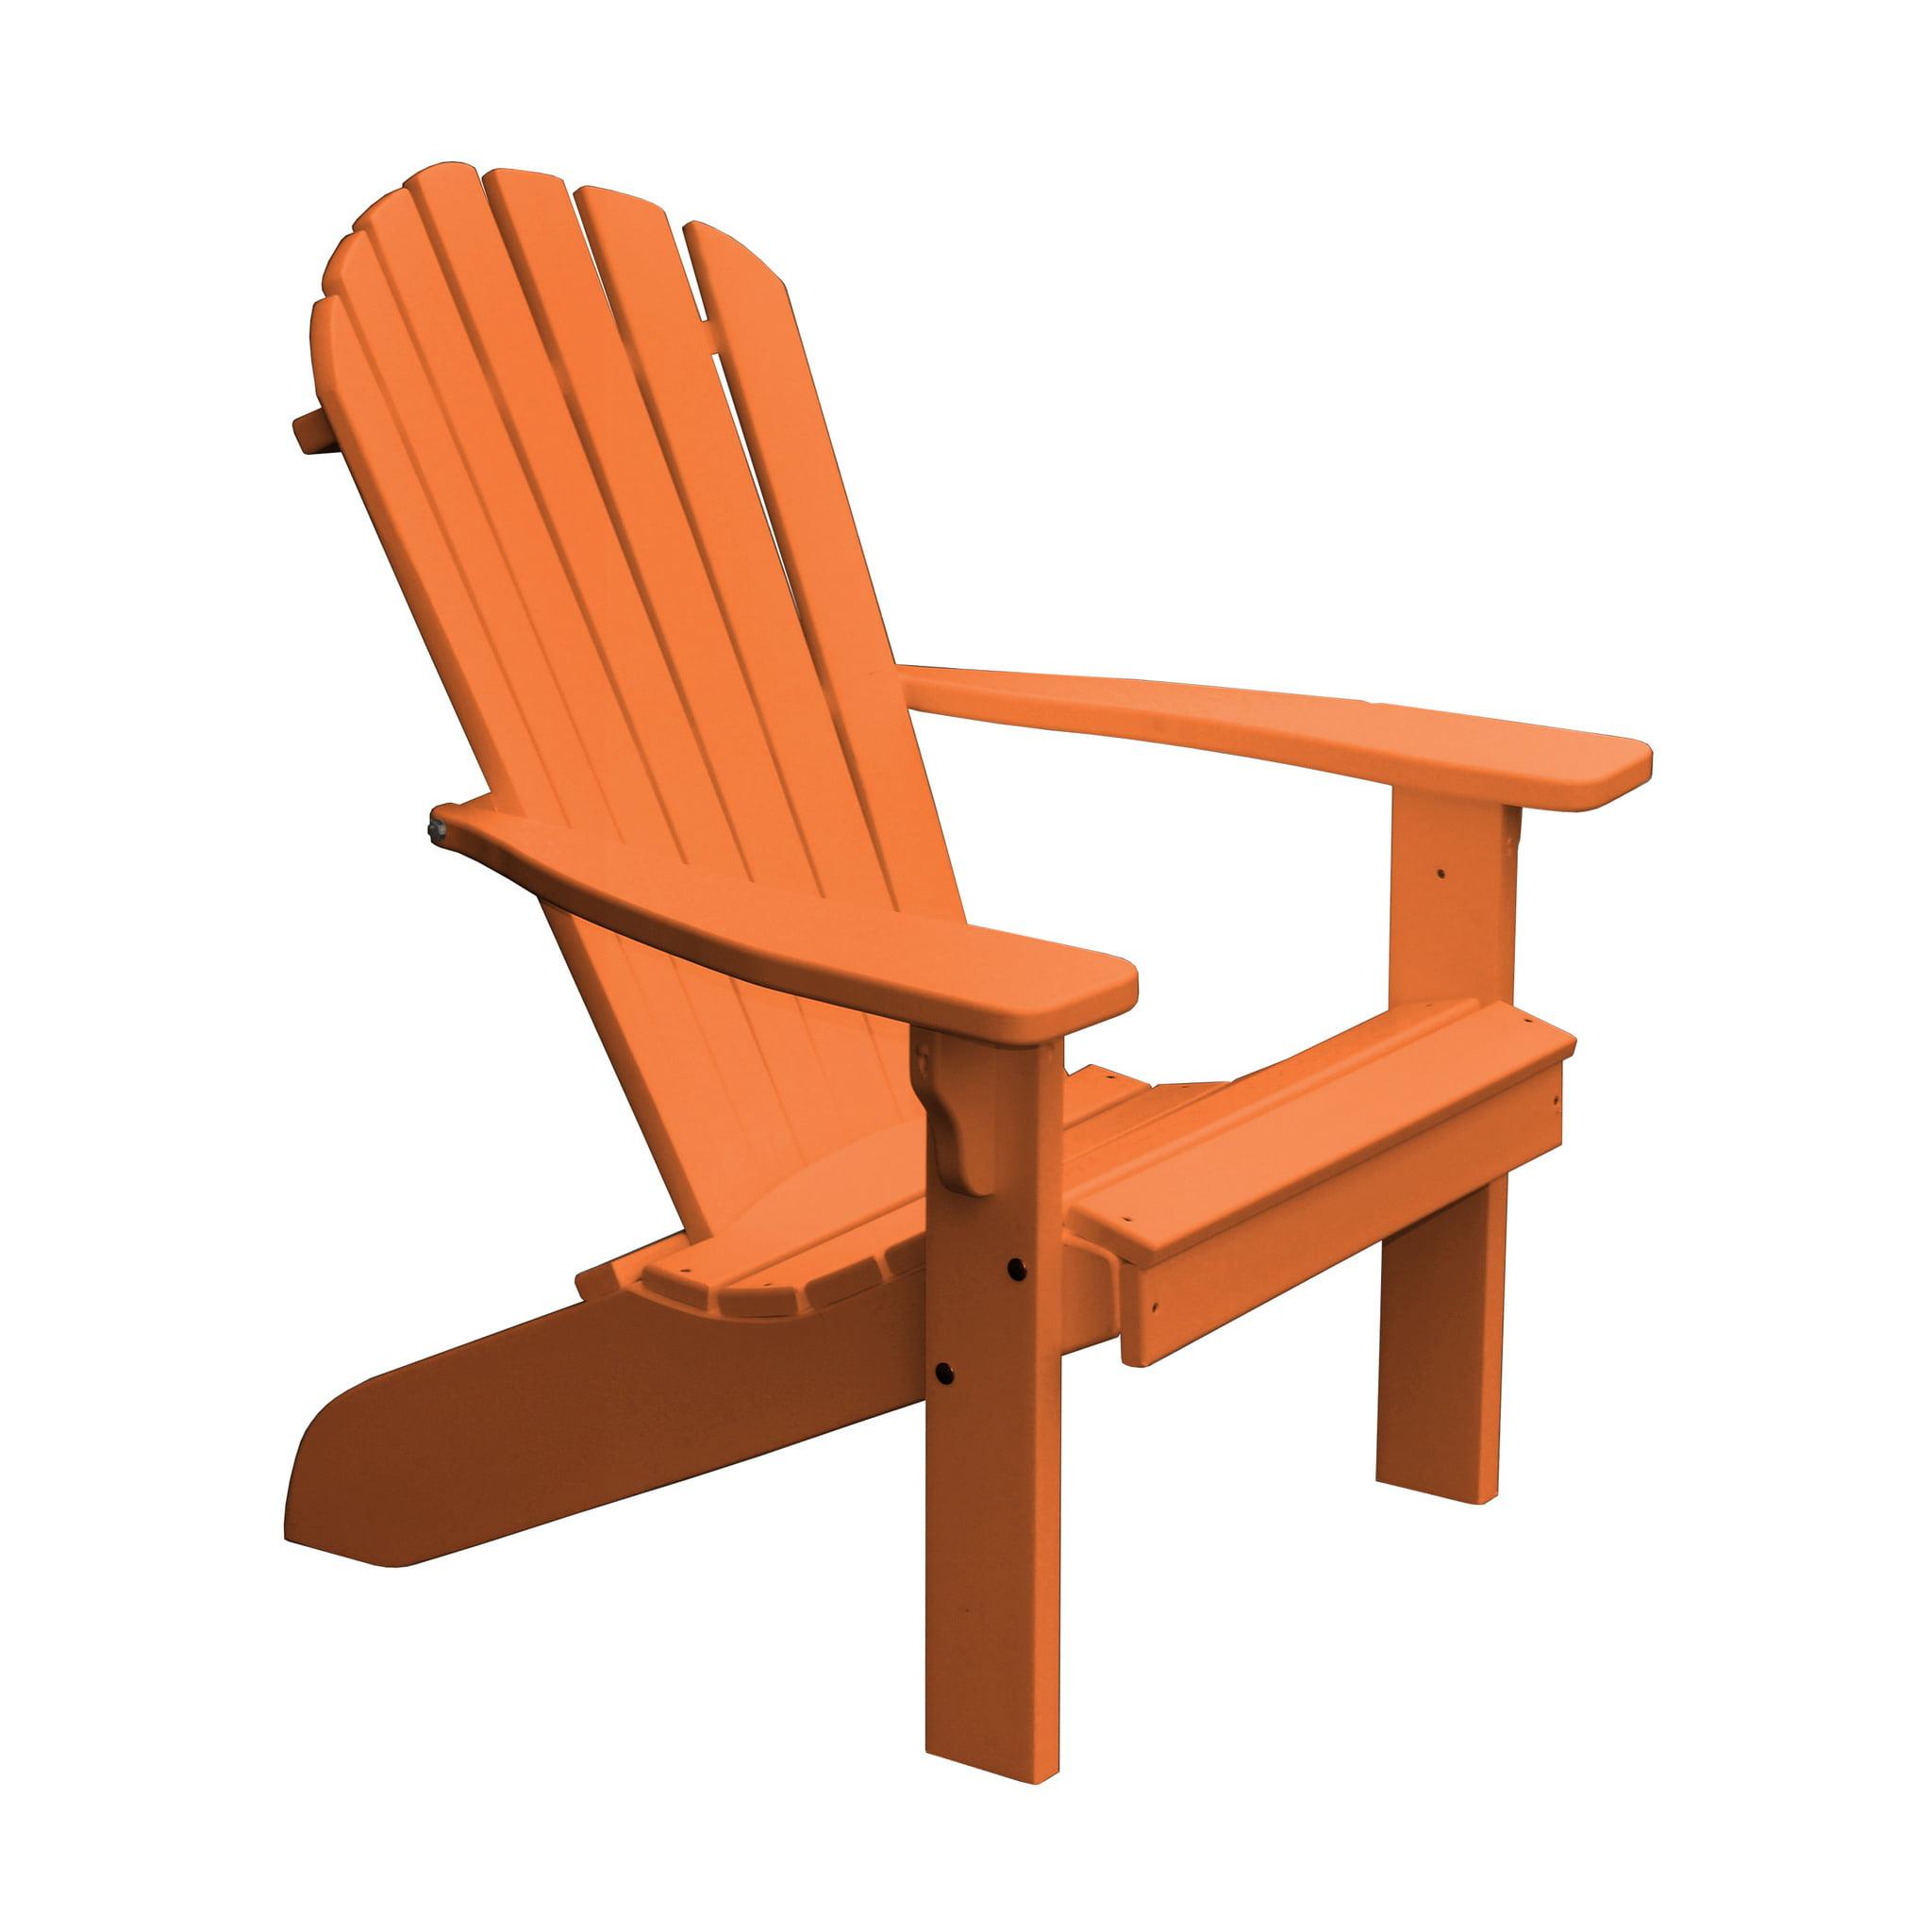 Furniture Barn USA® Poly Fan Back Adirondack Chair - Aruba Blue